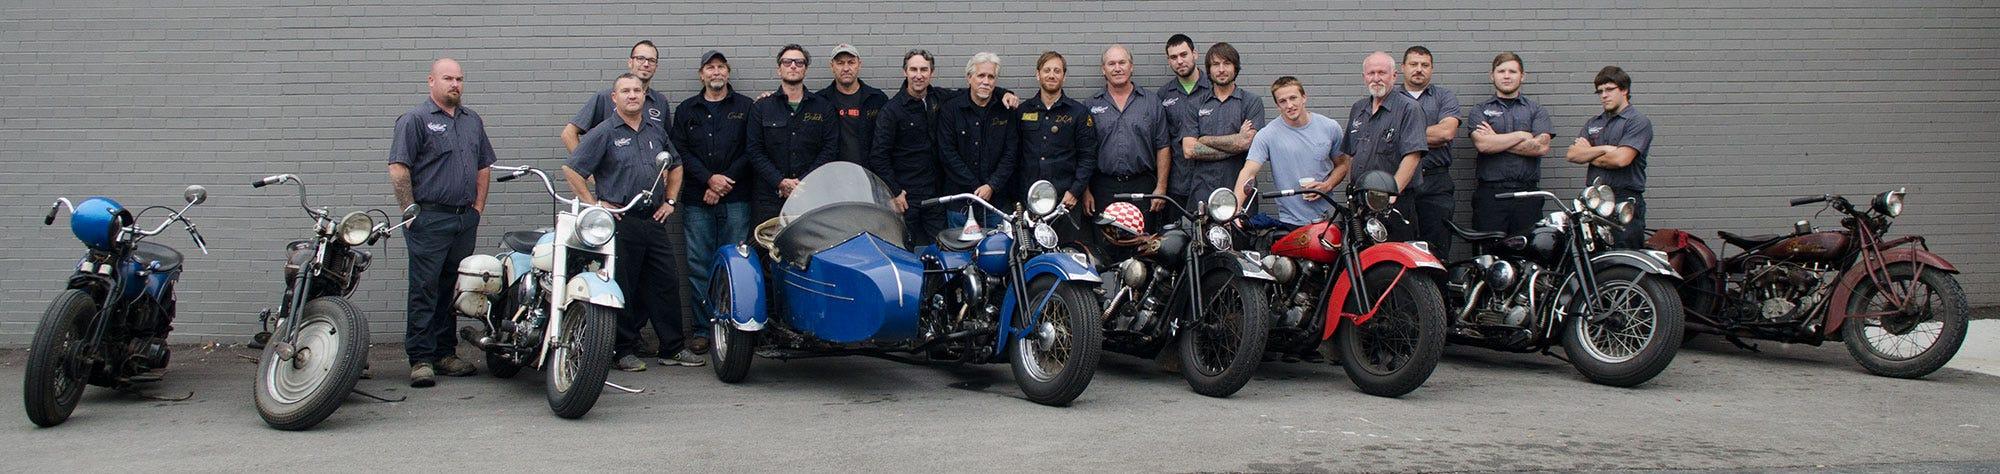 131015-lucky-riders-150